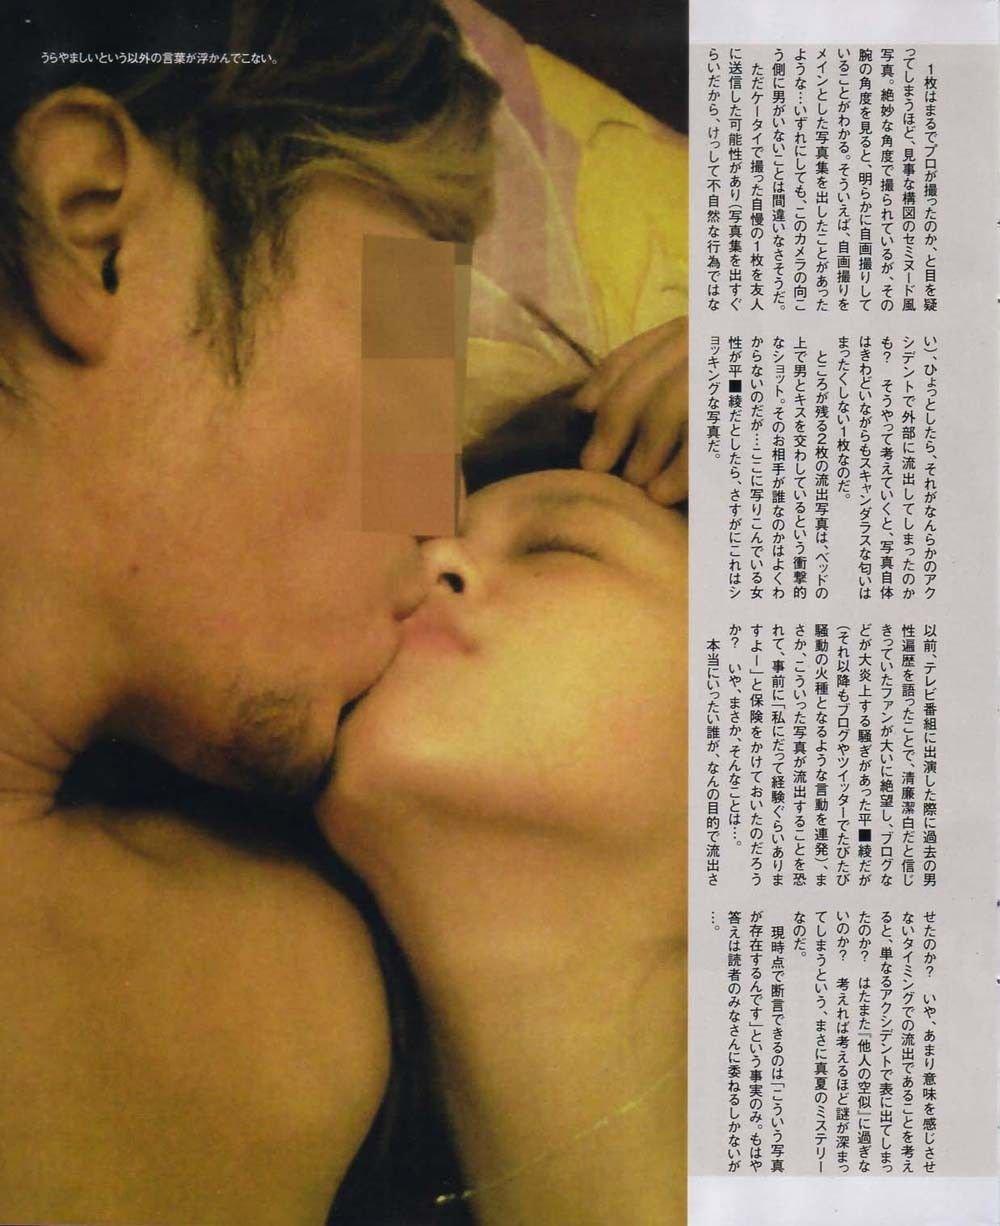 suzumiya haruhi fever settled f6a650ef.jpg?resize=300,169 - 涼宮ハルヒフィーバーも落ち着いて平野綾は今なにをしている?